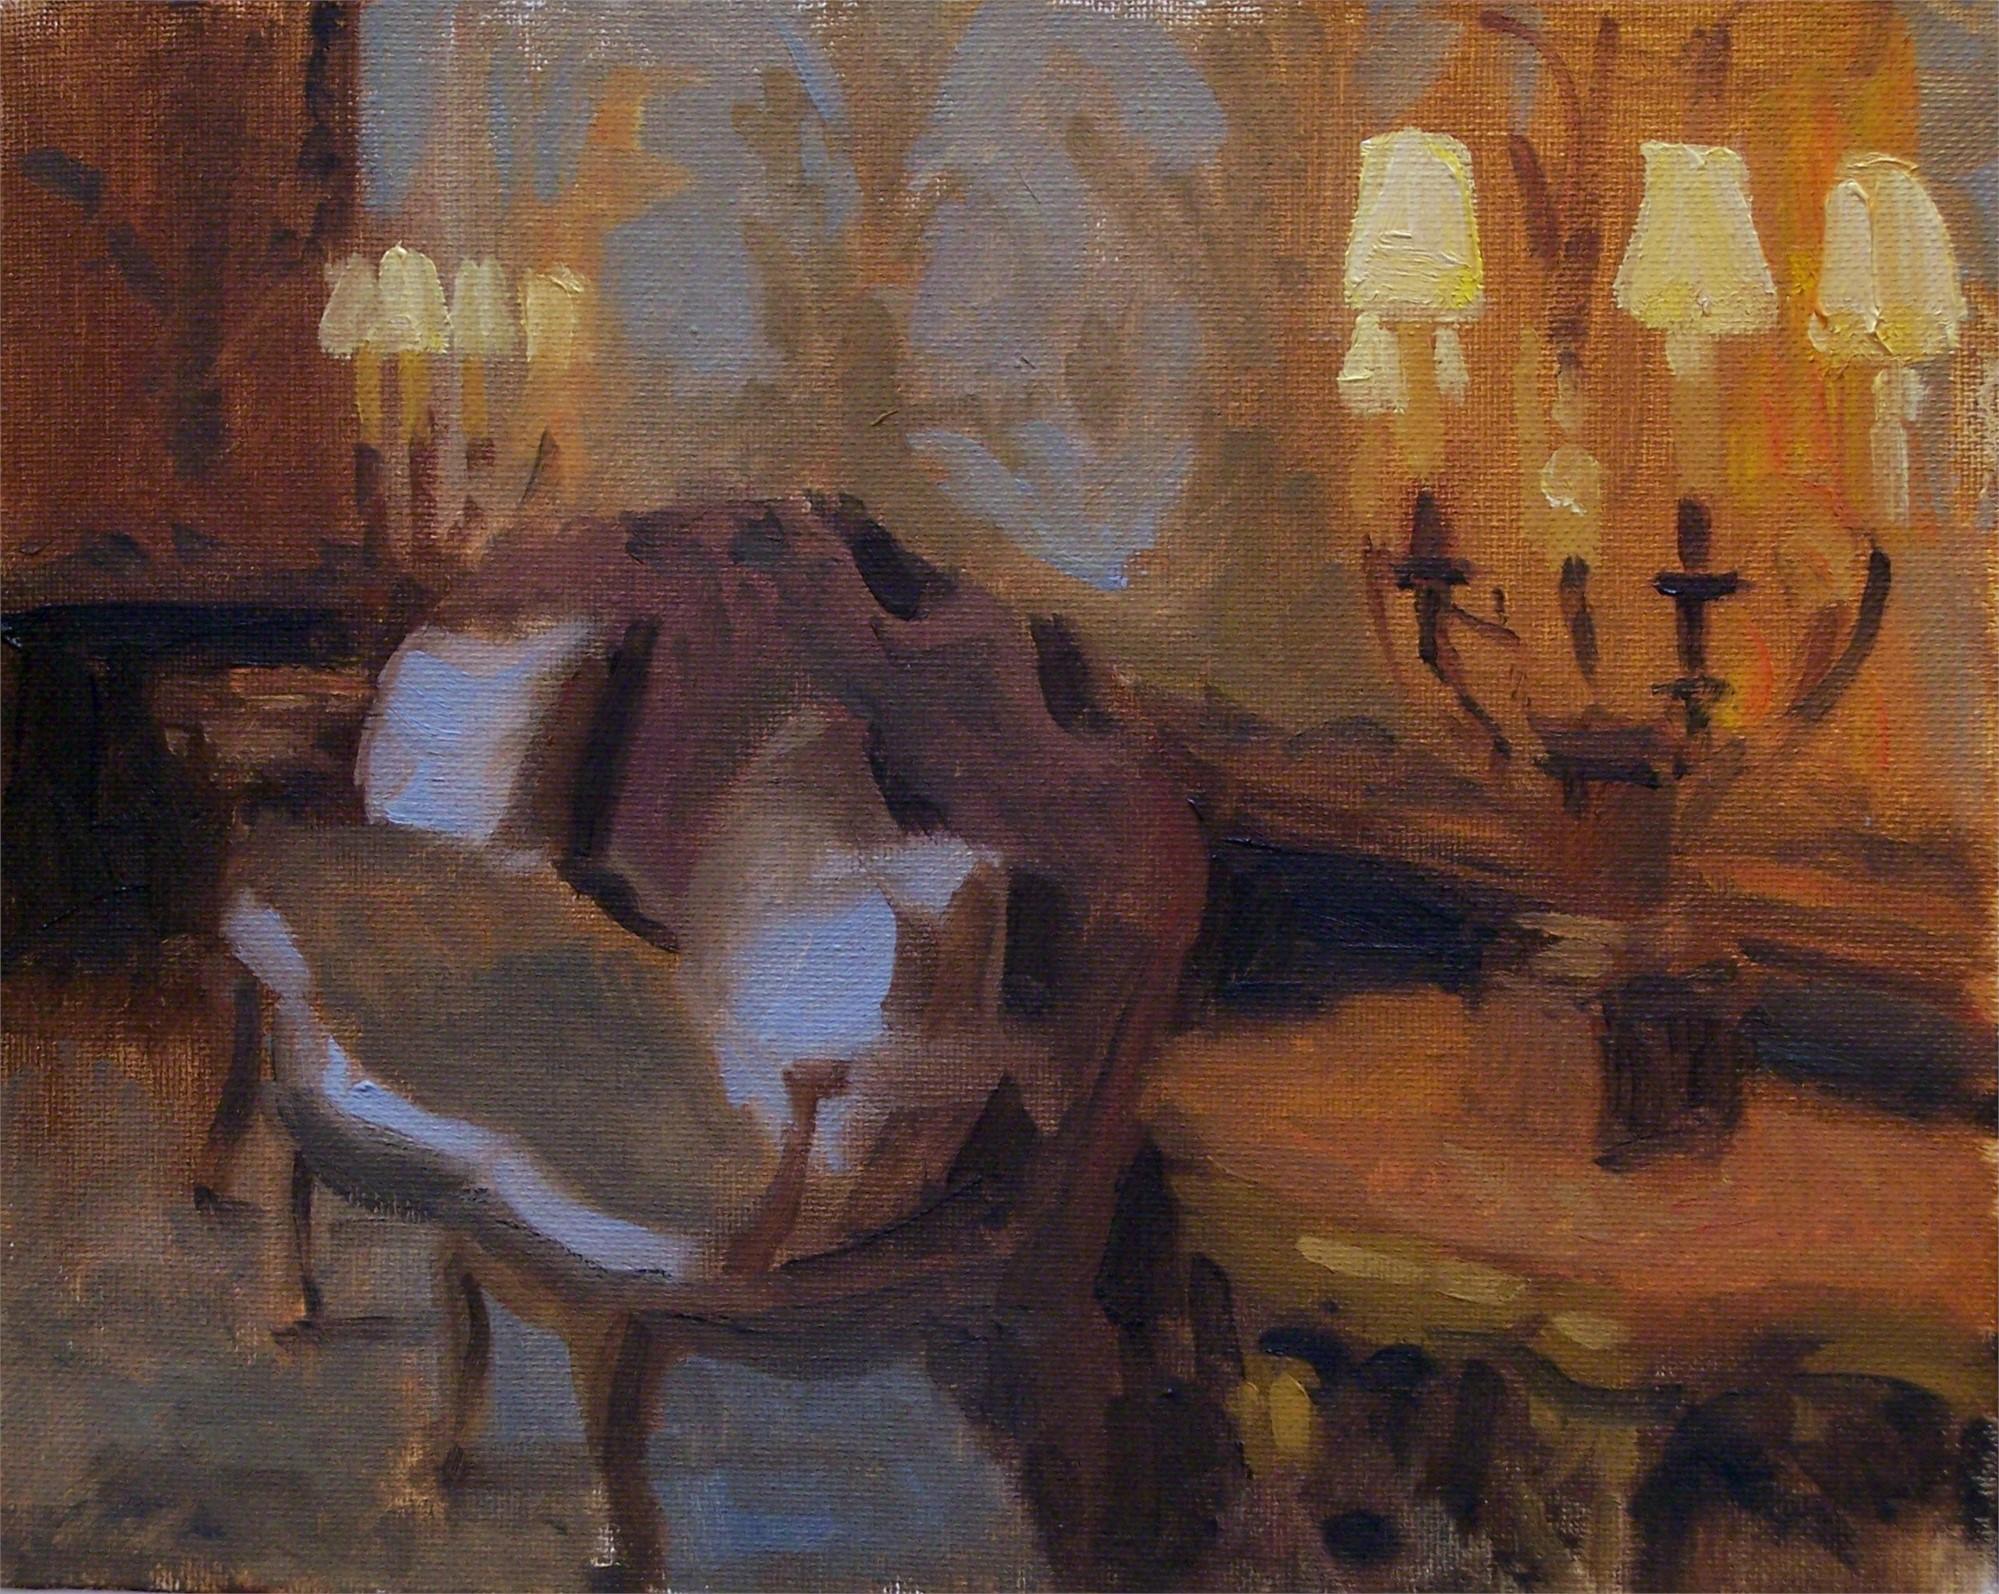 Elegant Interior by Joe Gyurcsak